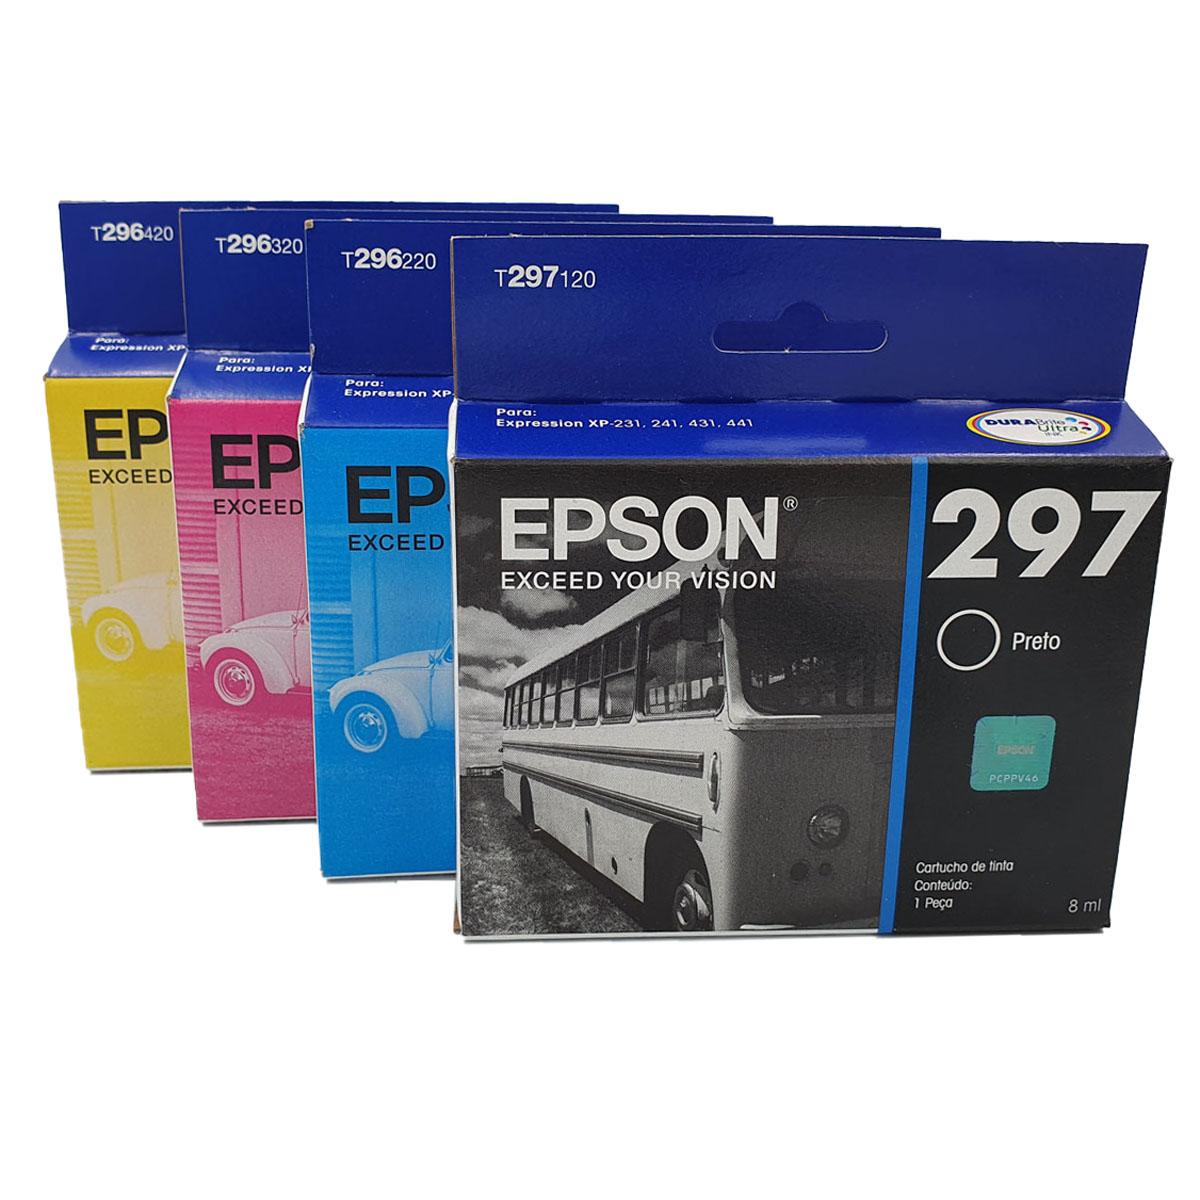 Kit 4 cartuchos T297 T296 preto e colorido originais Epson para XP231 XP431 XP231 XP431 TO297 TO296